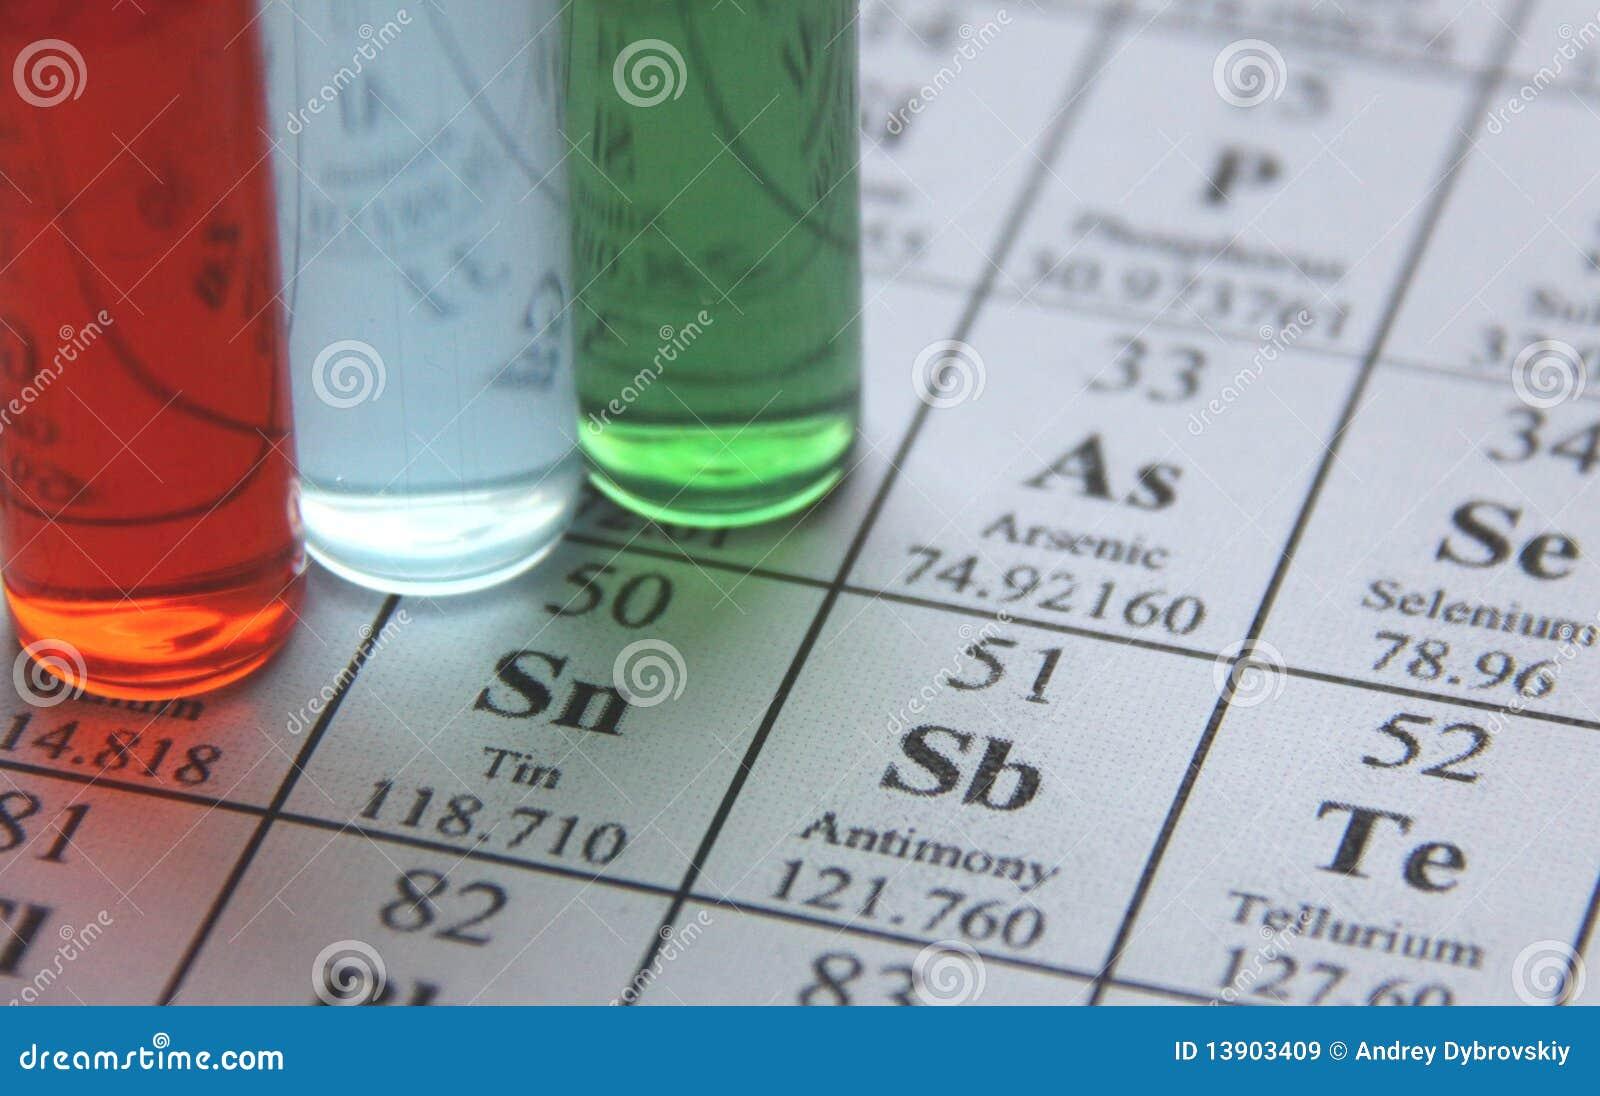 Chemii serii próbna tubka